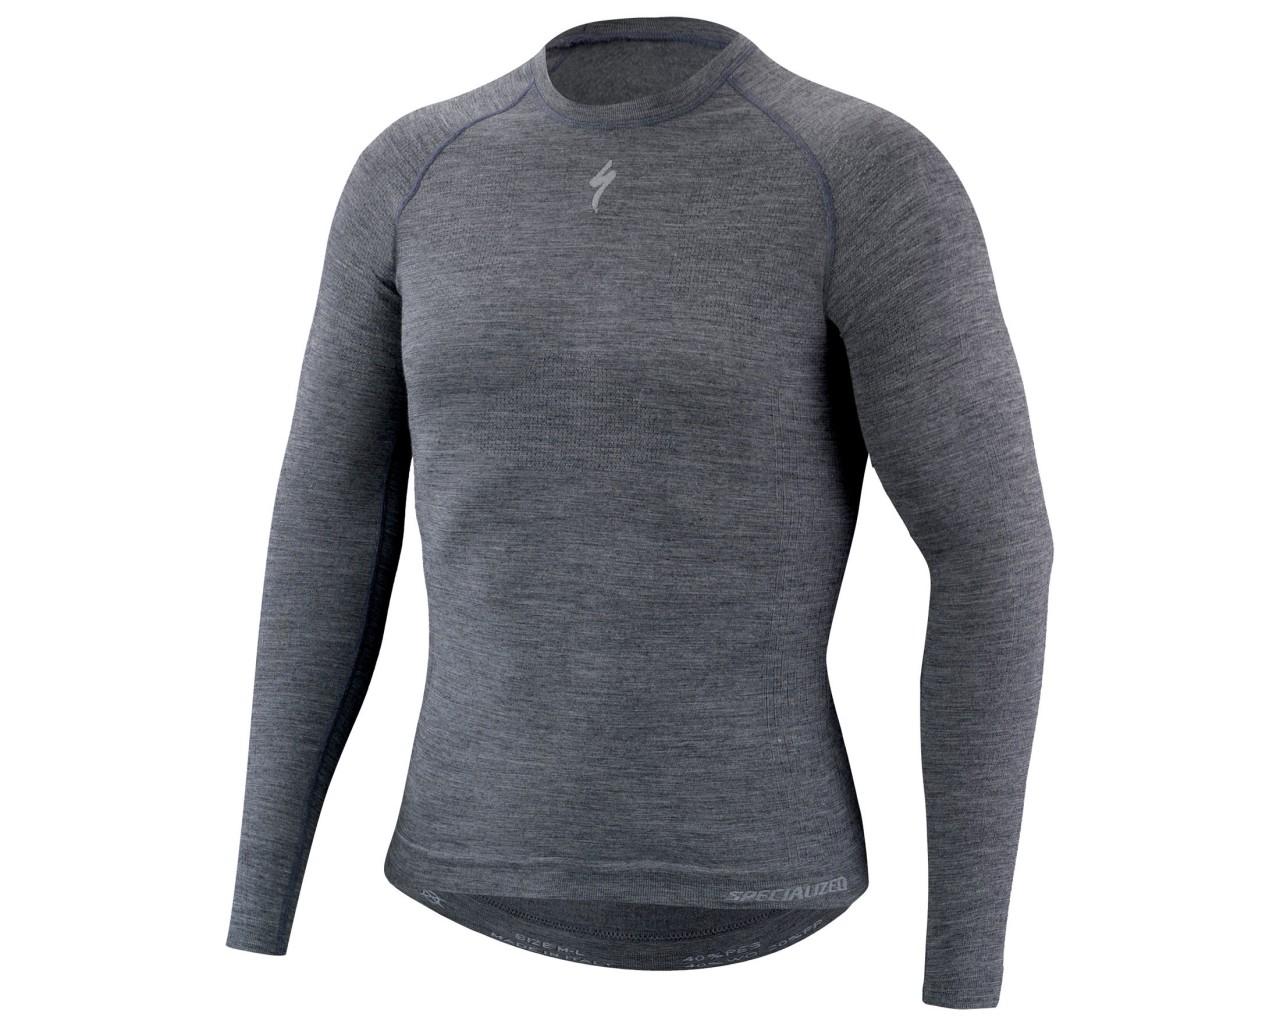 Specialized Seamless Merino Baselayer longsleeve   grey